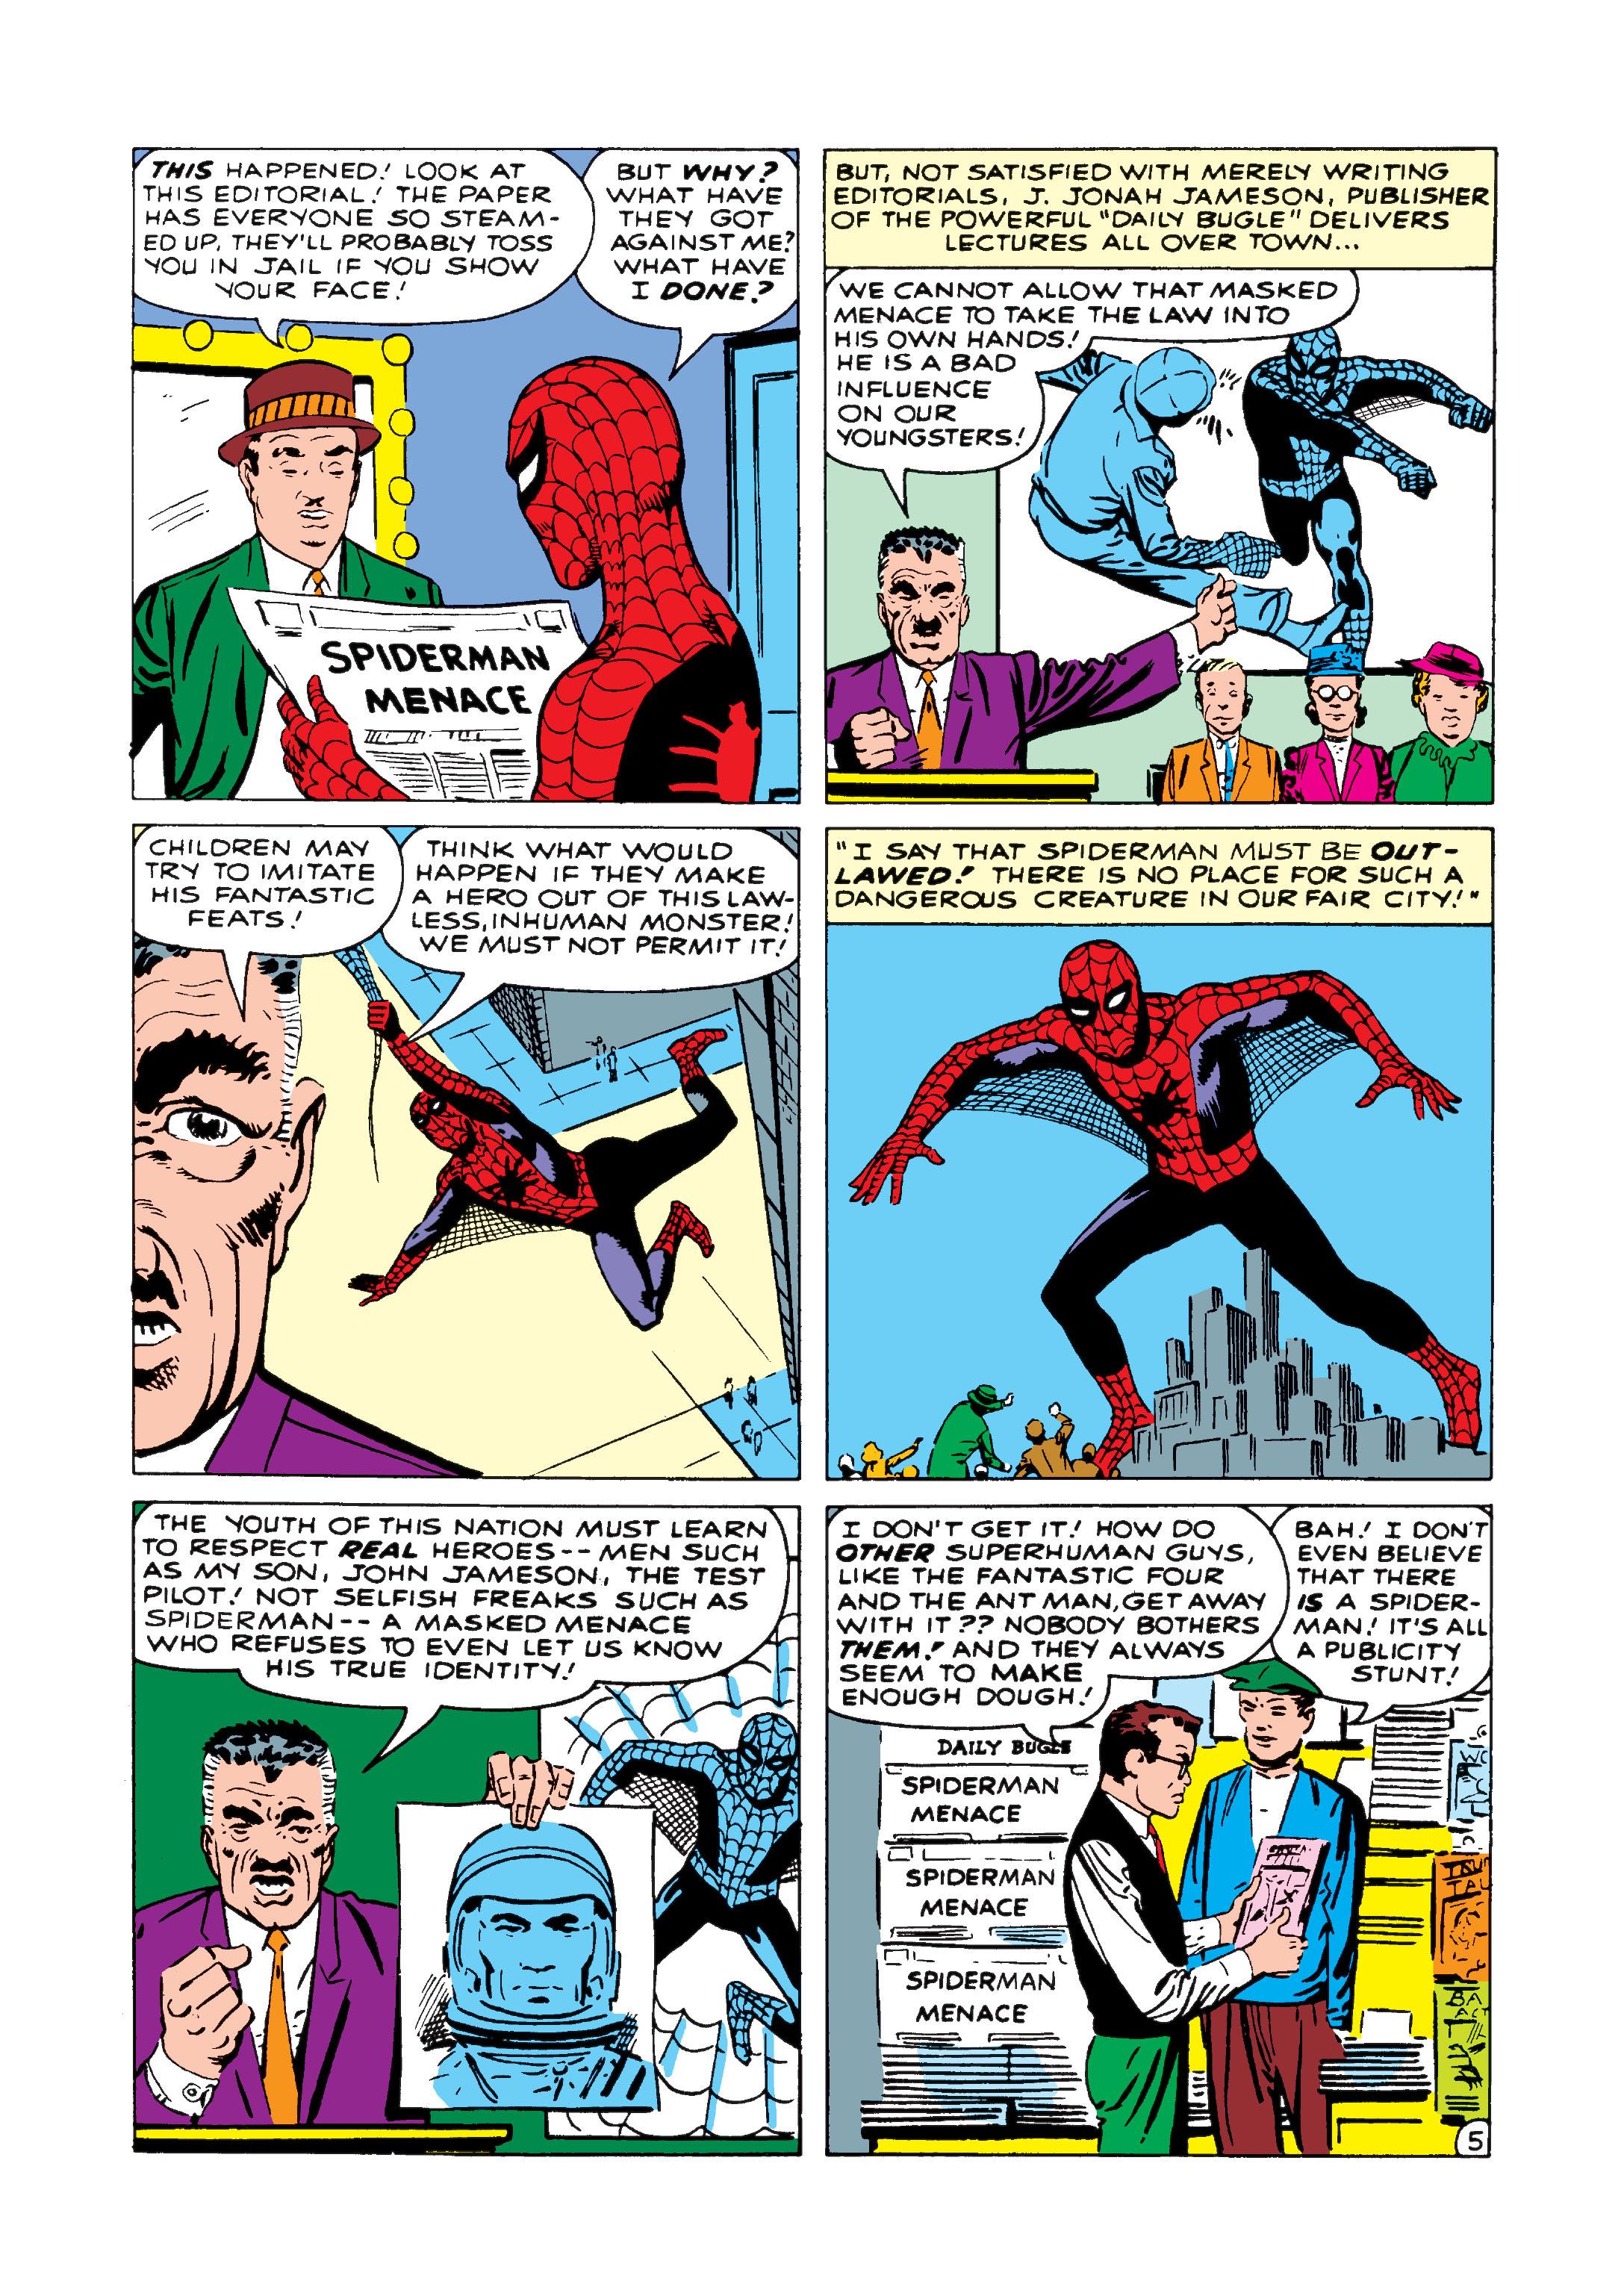 Spider-Man Character Study ― The Ultimate Essay UTyiCozblfDK2RW2pHqlTp-WUyoYWrCWuGm9zeyzxE-1hdIYrbRf4ysF9EVqySyGx8pS6wNzEY-H=s0